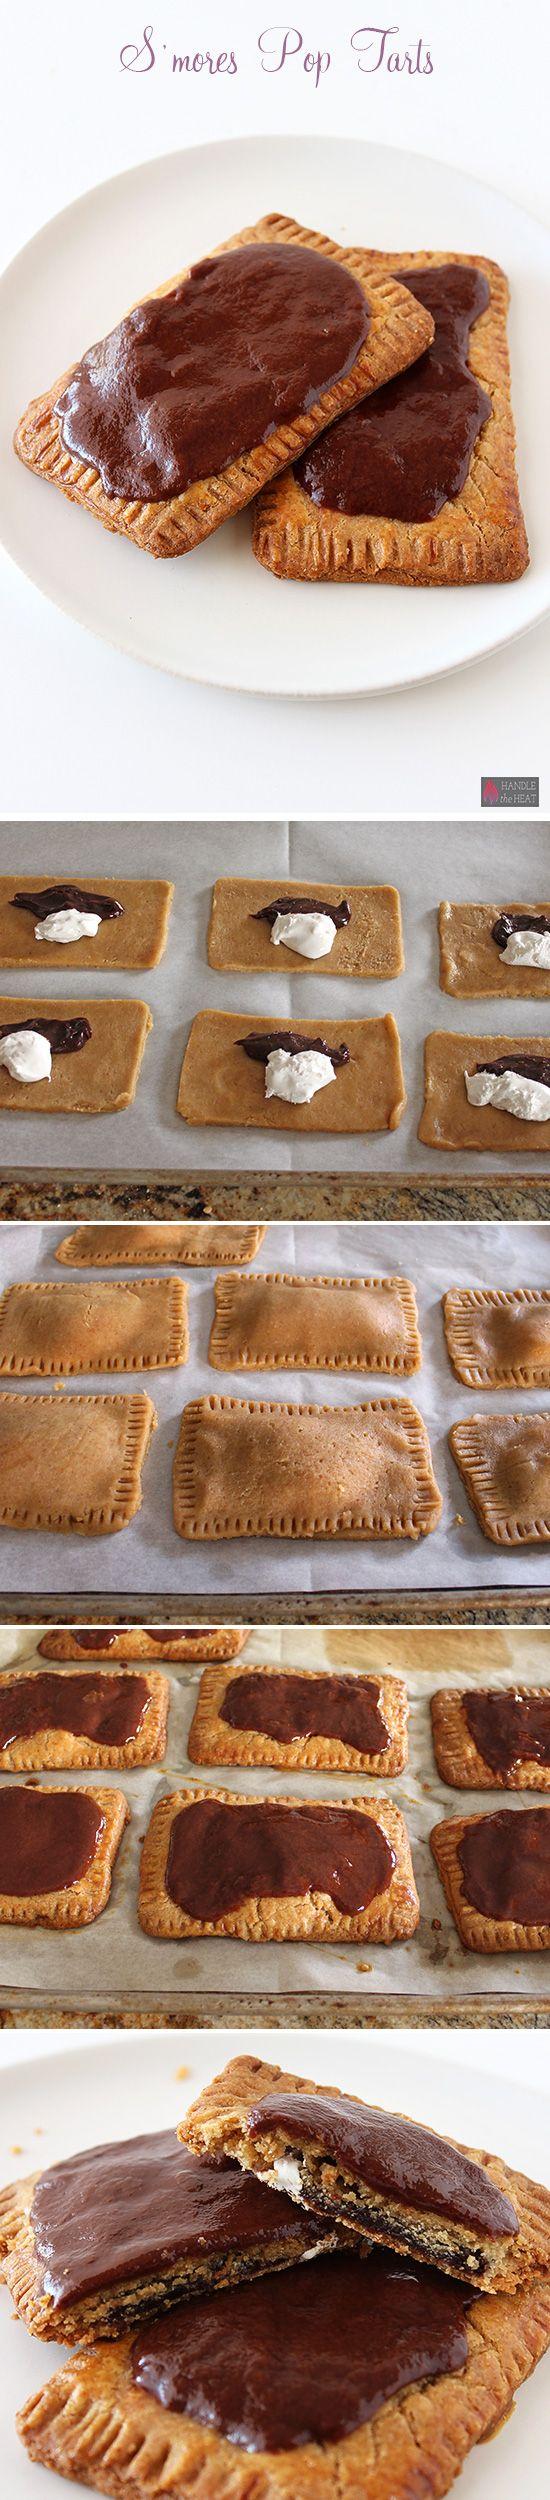 Homemade S'mores Pop Tarts - Amazing!